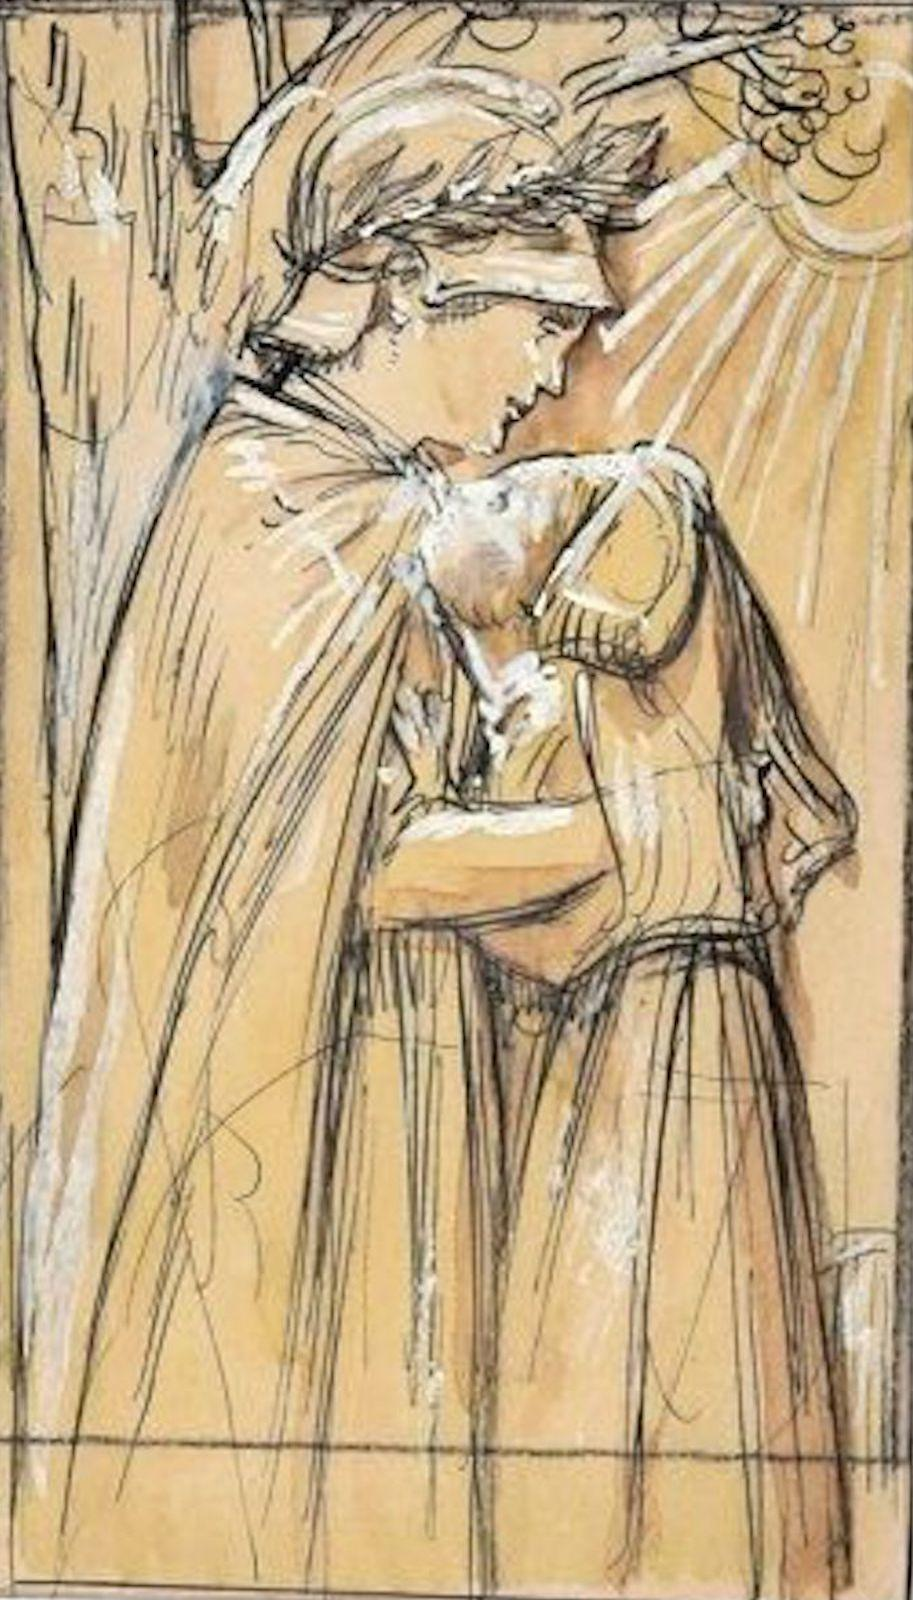 Embrace - Original China Ink Drawing by A. Giraldon - Early 20th Century